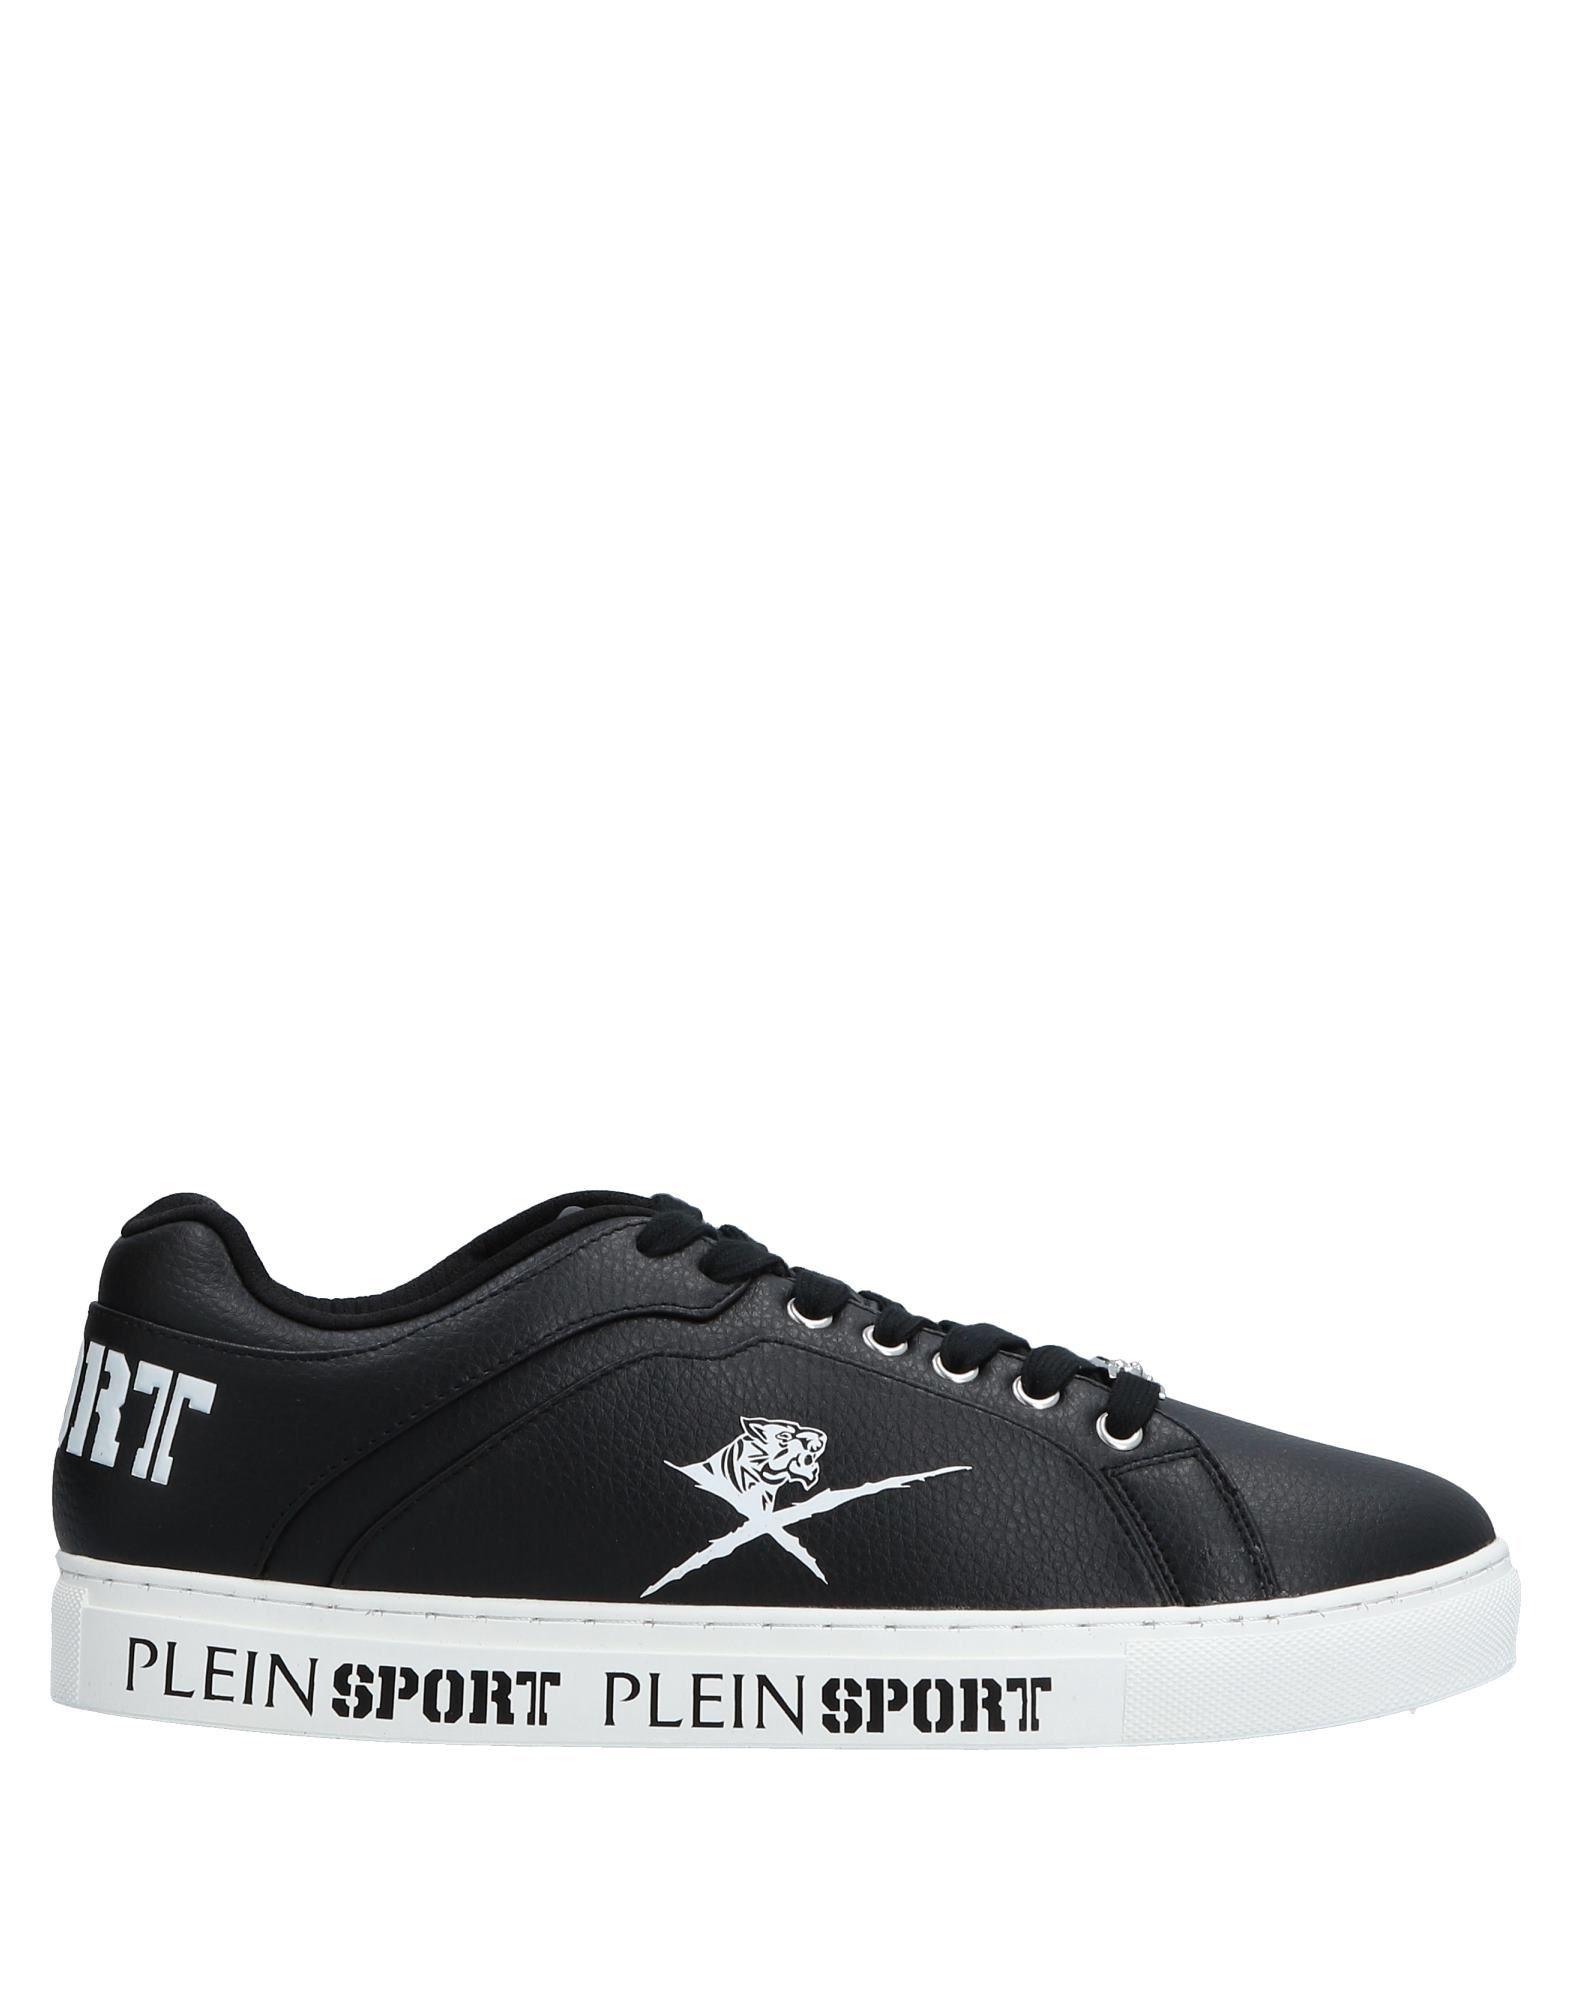 Plein Sport Sneakers Herren  11530652PD Gute Qualität beliebte Schuhe